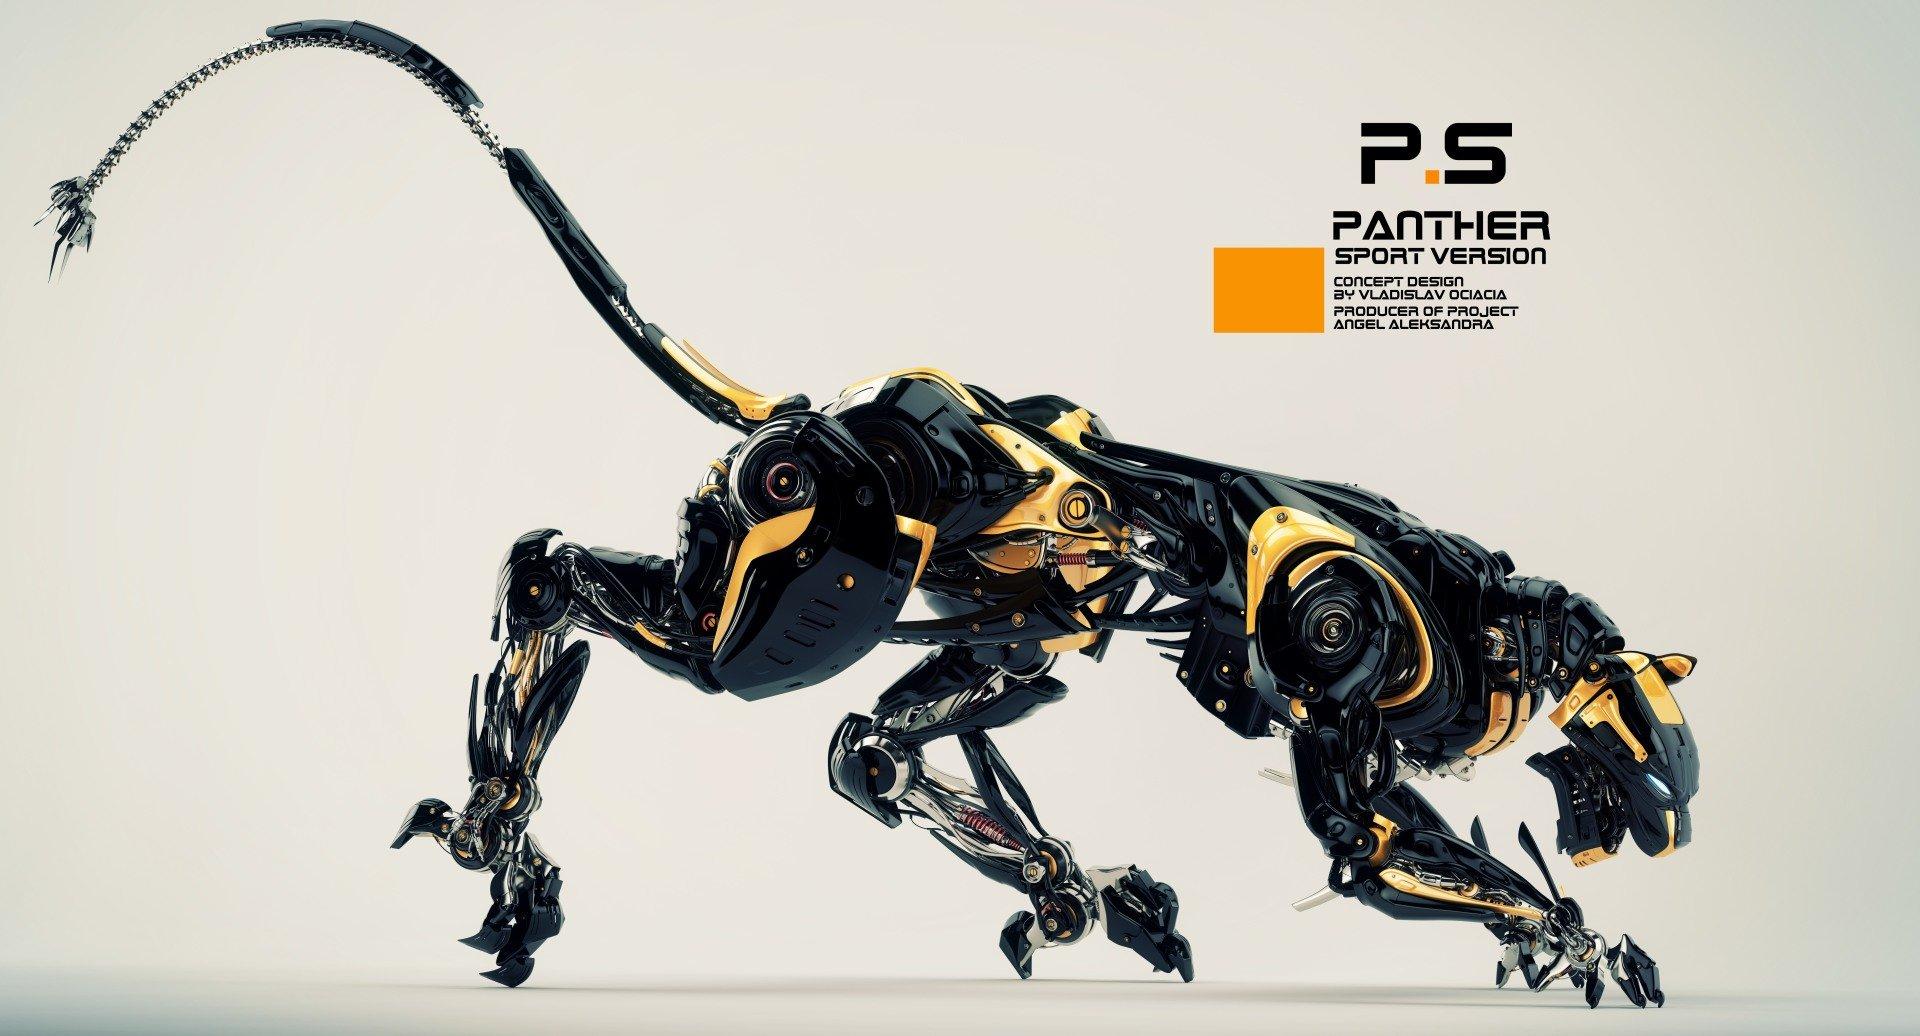 Vladislav ociacia robotic panther 8